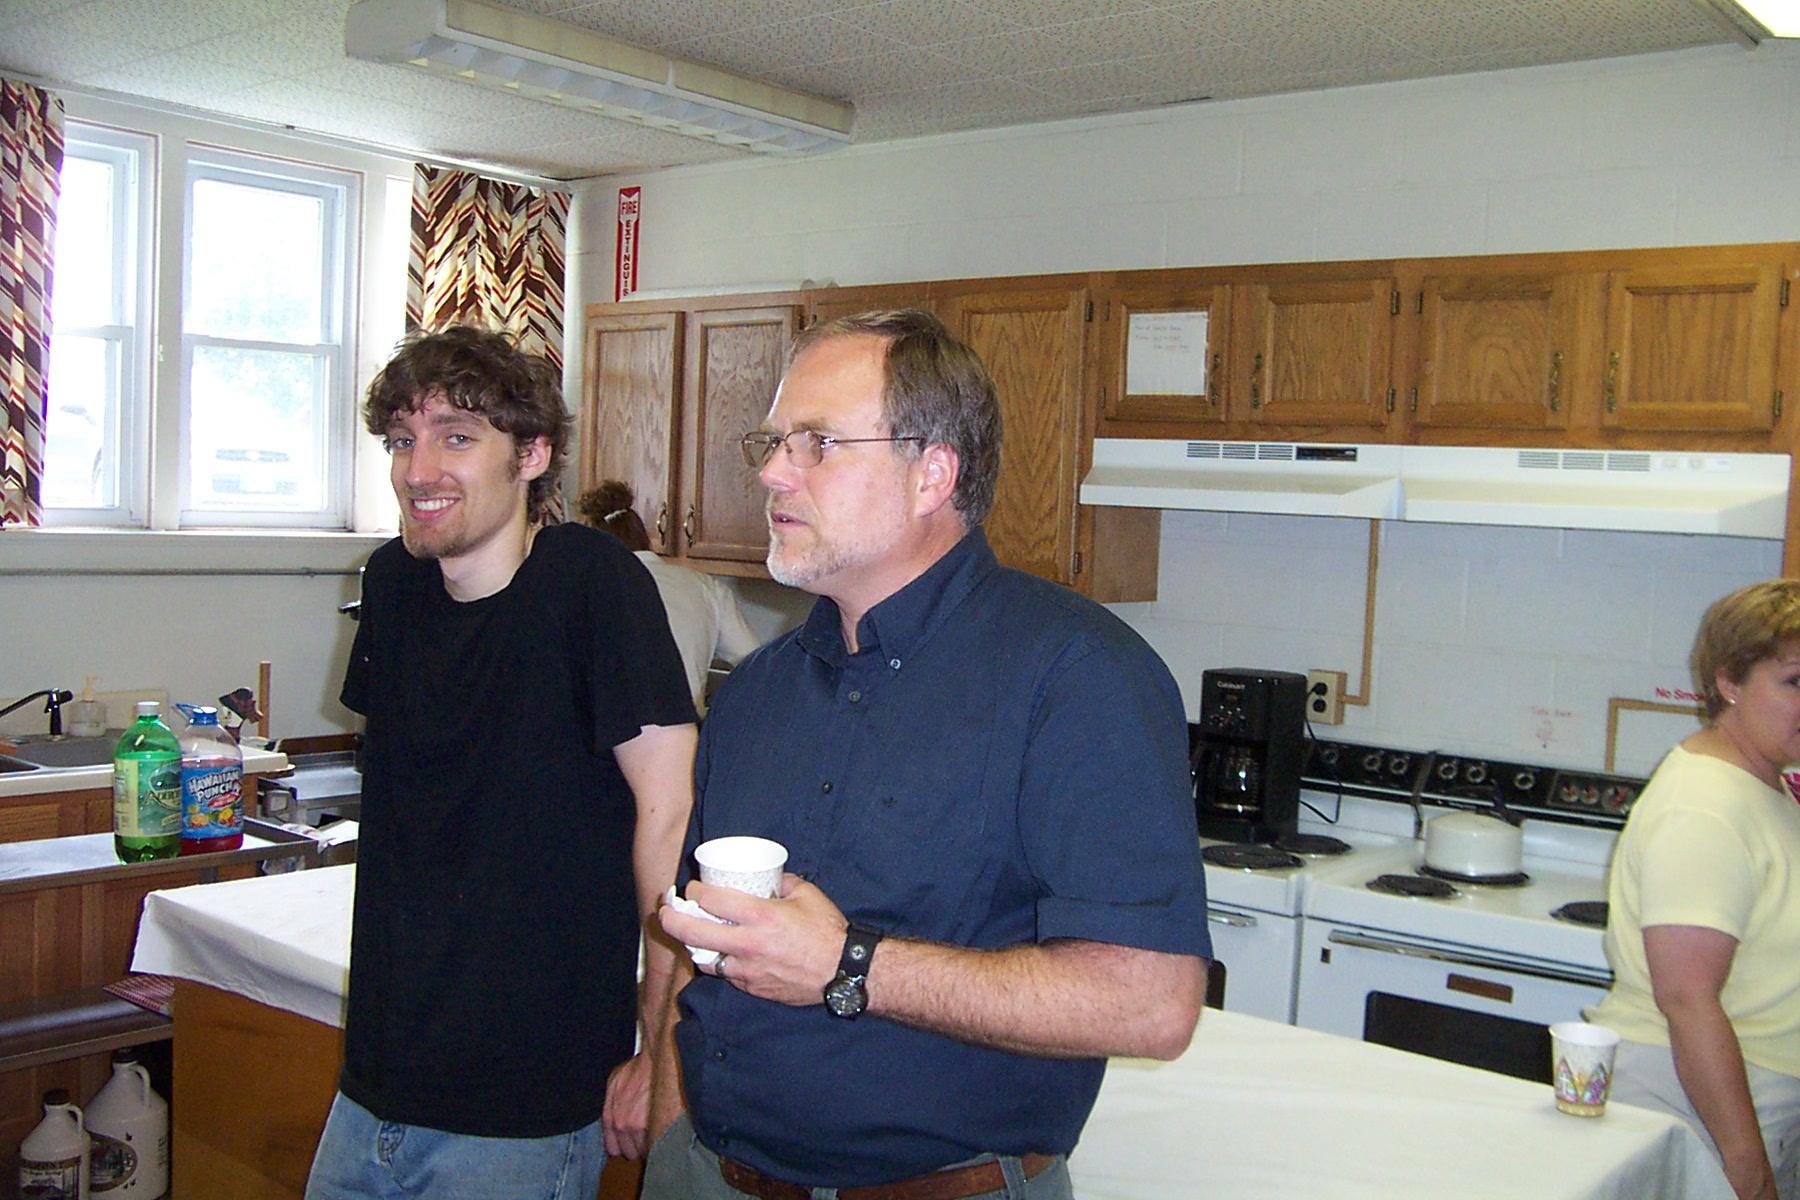 Pat Fitzgerald & Doug Lantagne - 2008-06-29 020